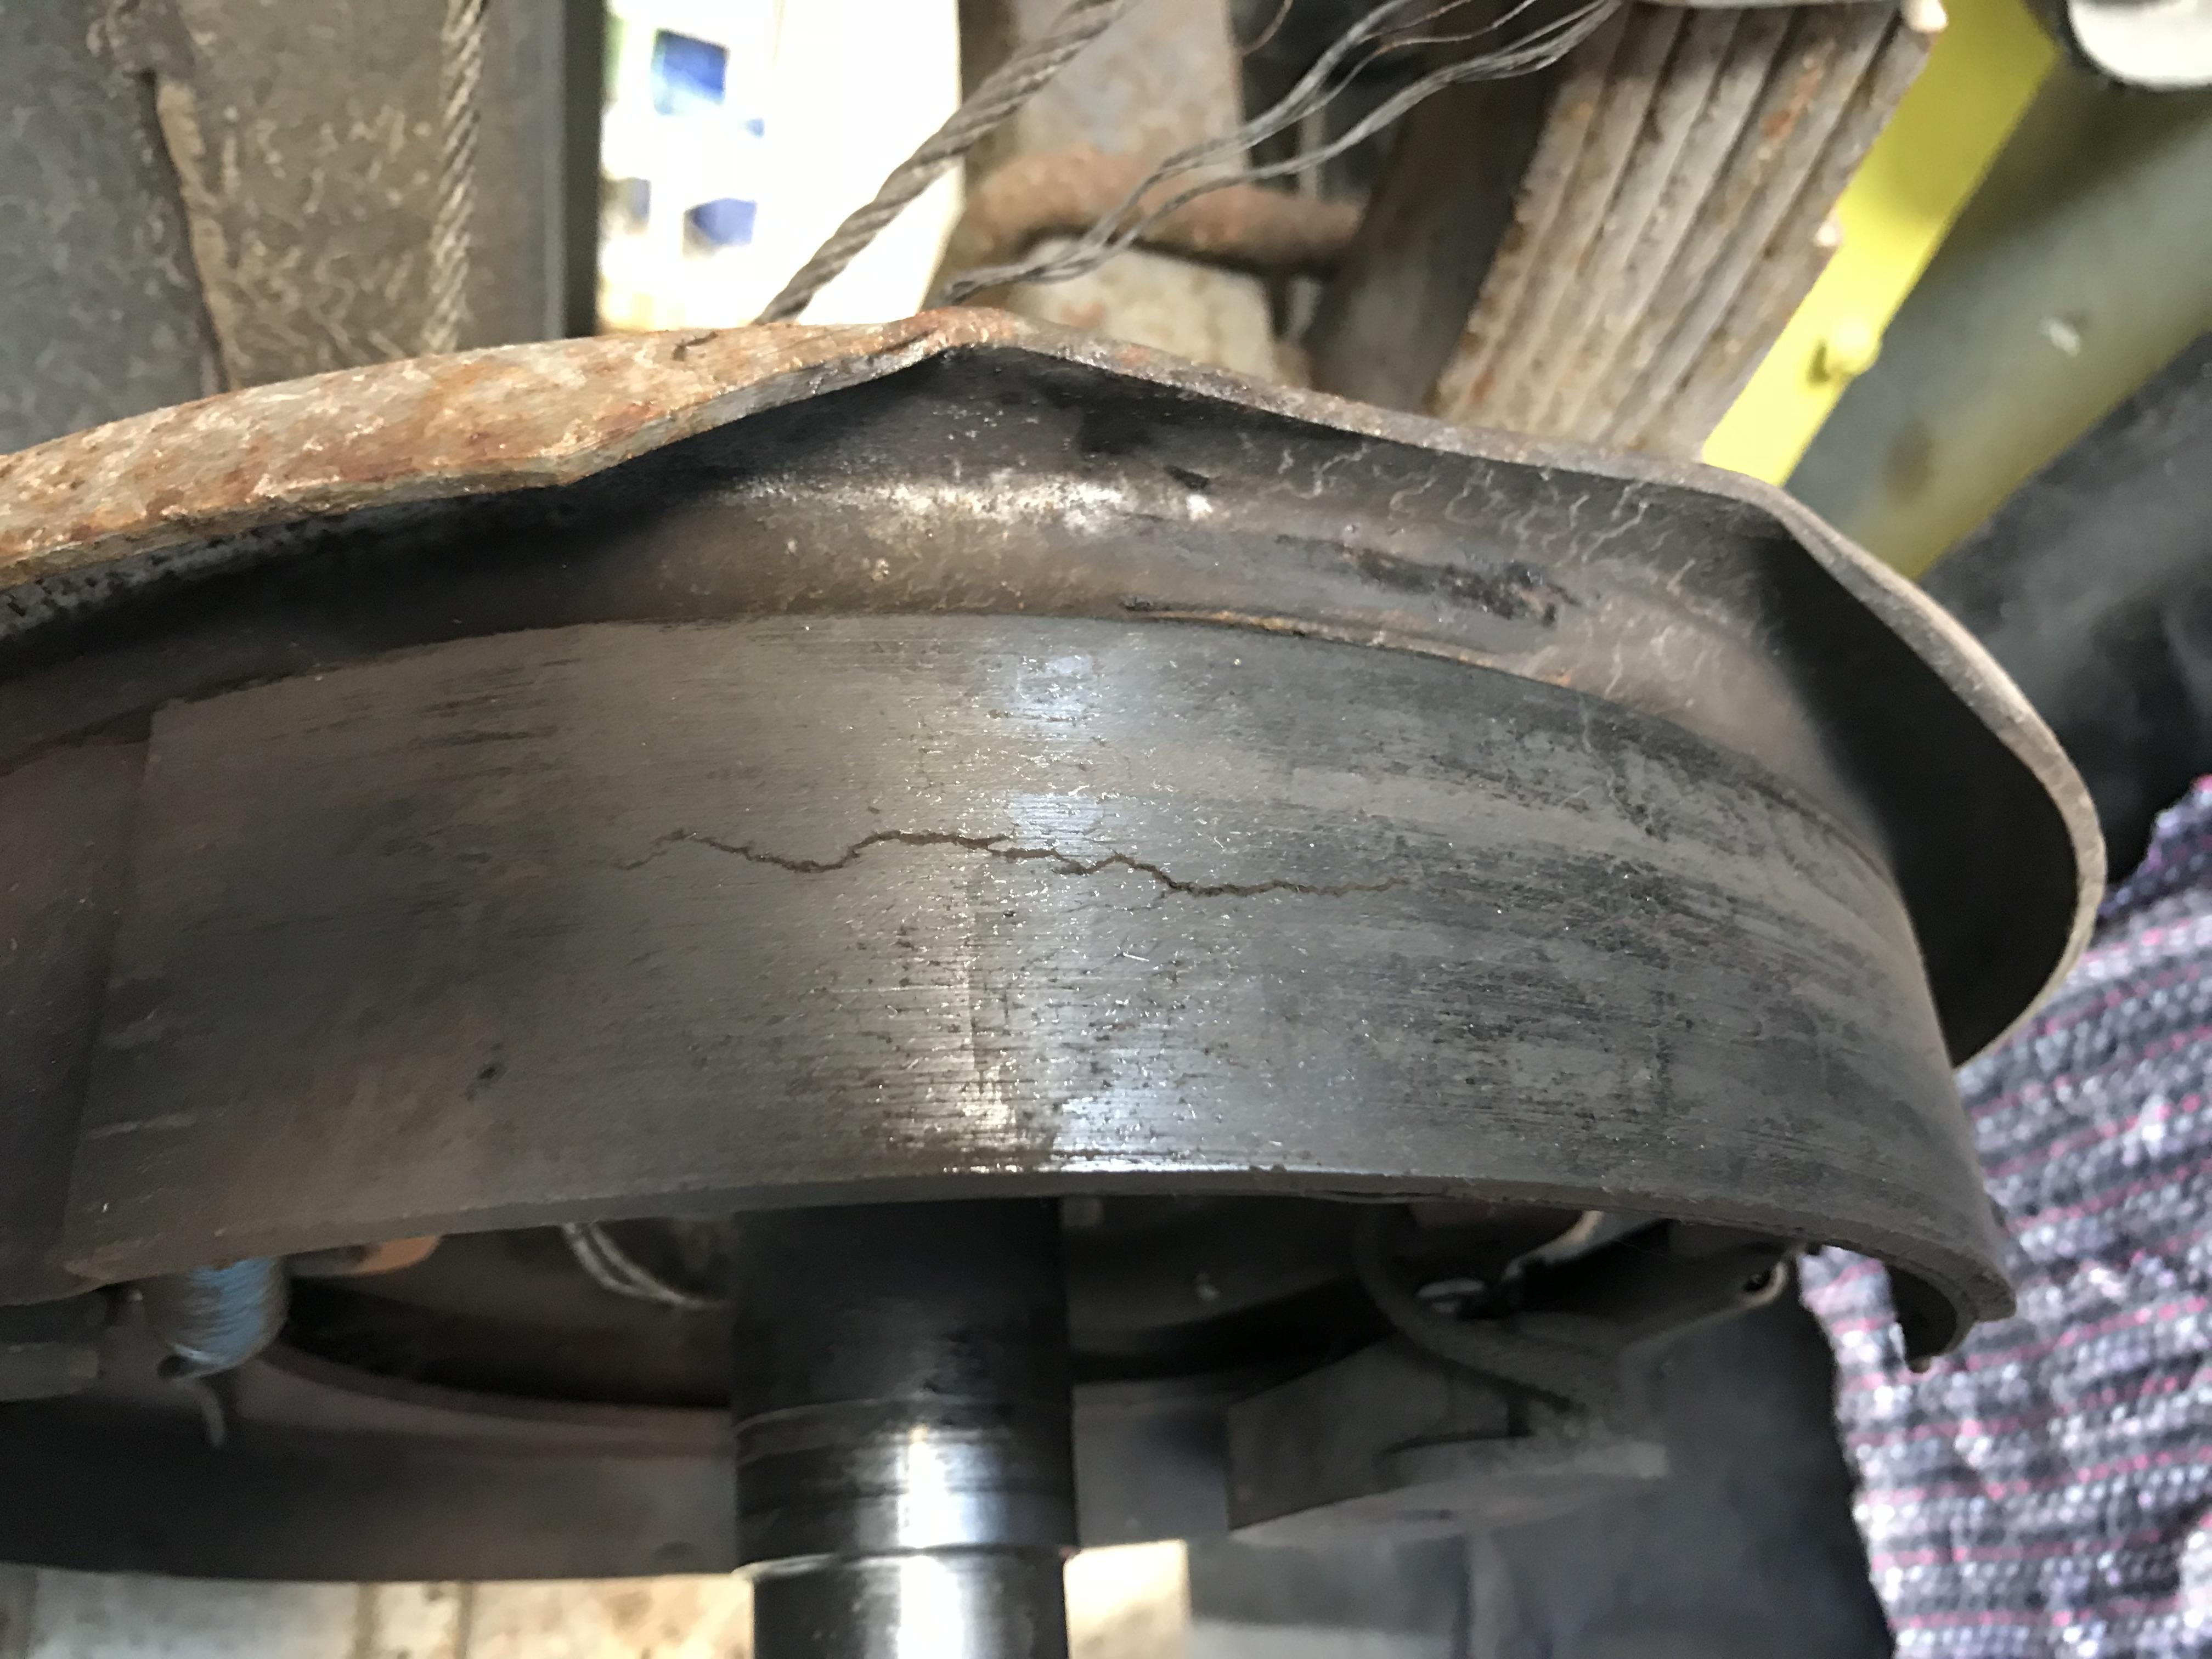 Brake pad crack